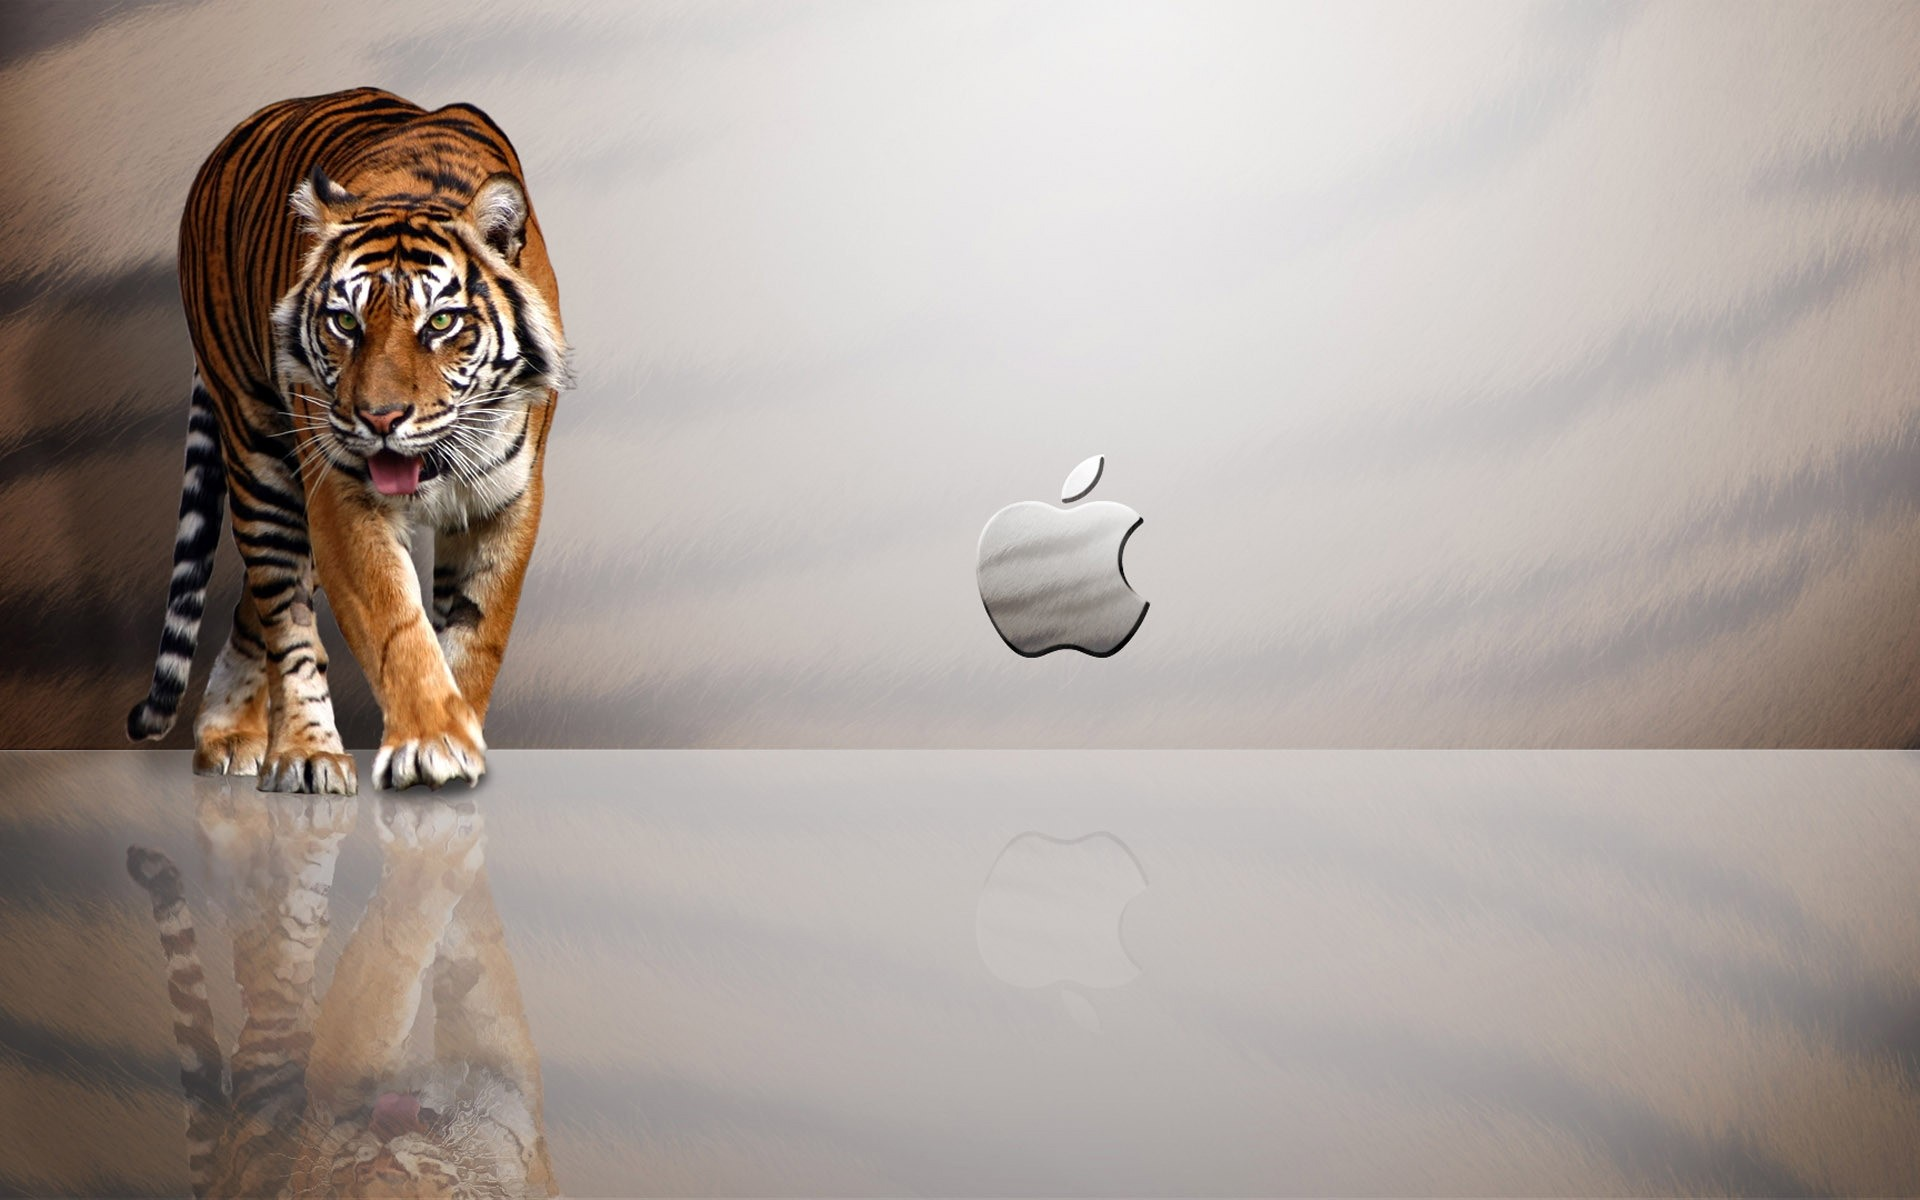 обои на телефон тигрята фотообои одному основных типов